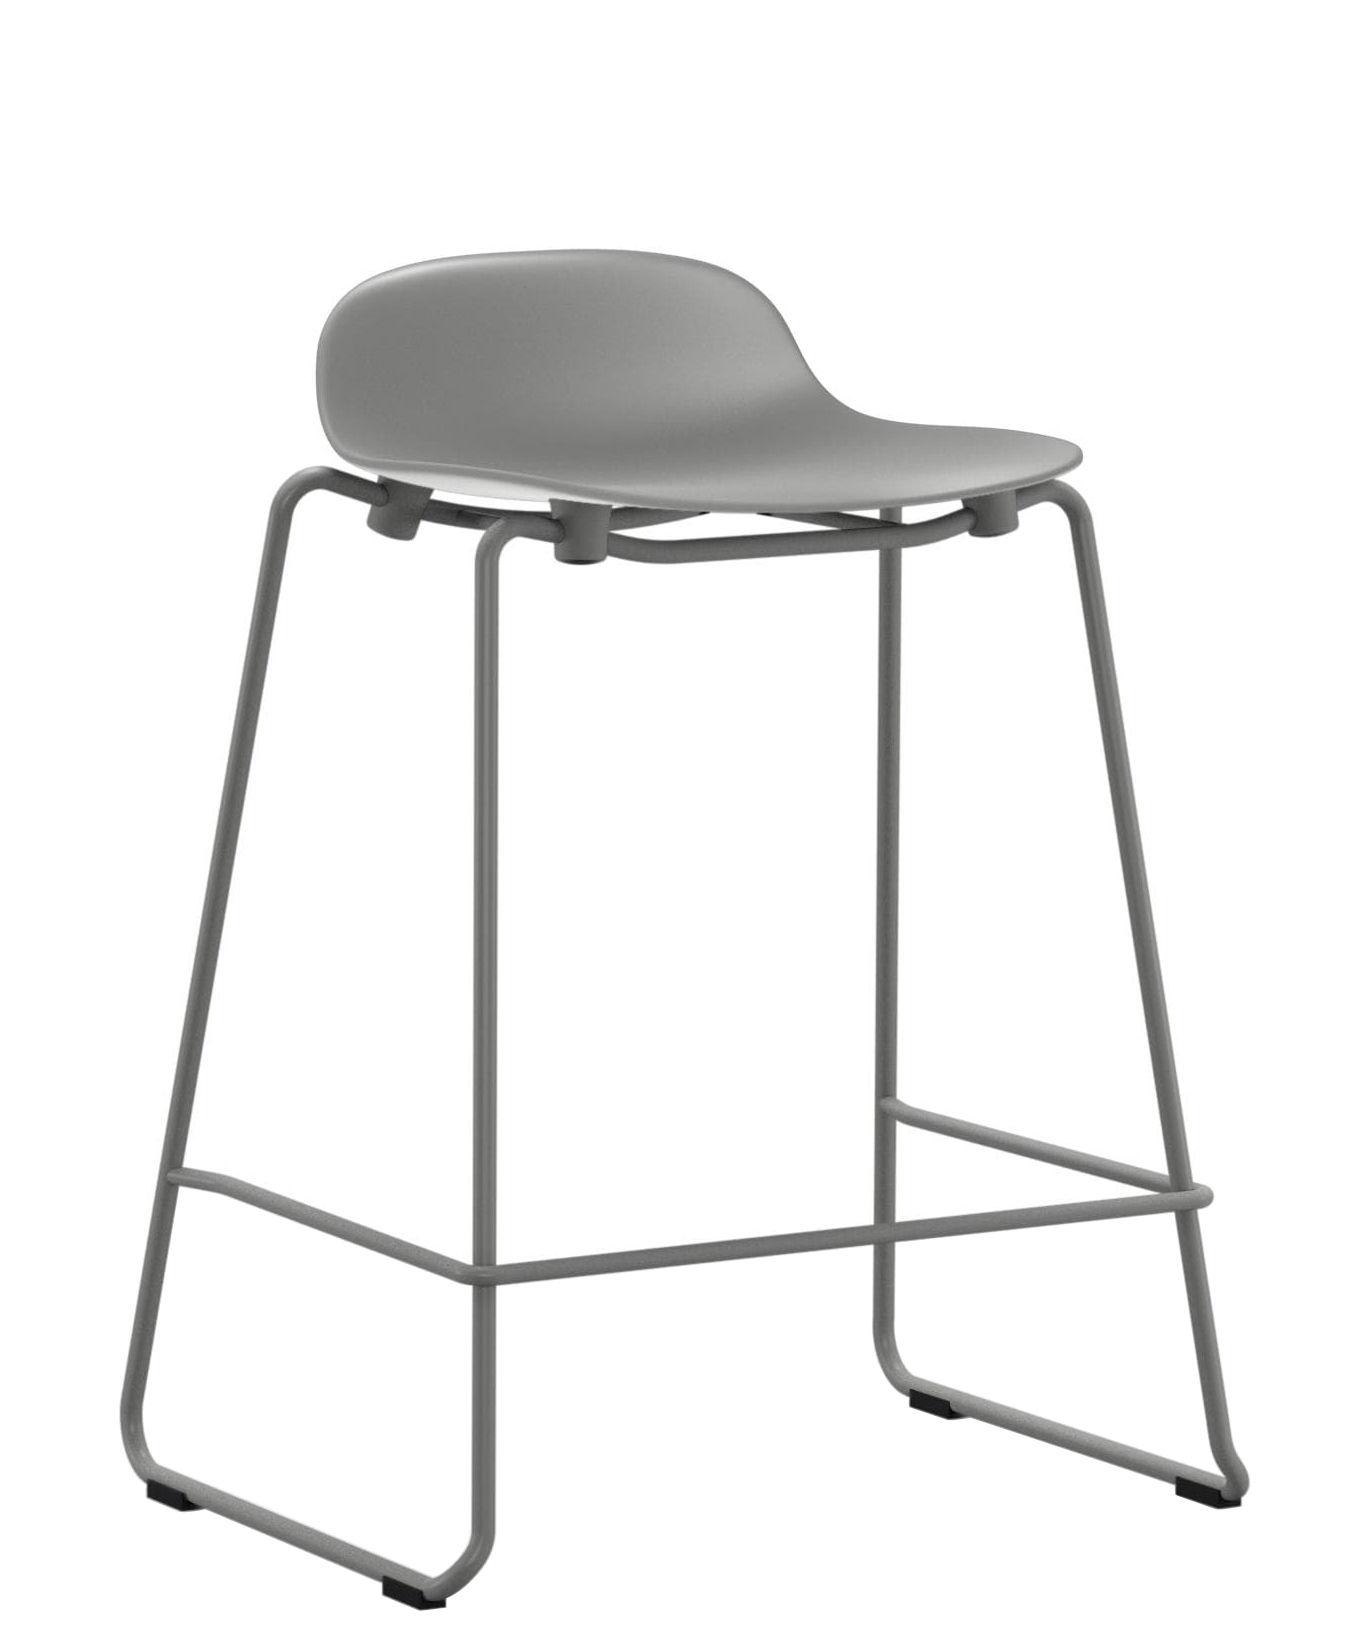 Furniture - Bar Stools - Form Bar stool - stackable / Metal legs - H 65 cm by Normann Copenhagen - Grey - Lacquered steel, Polypropylene